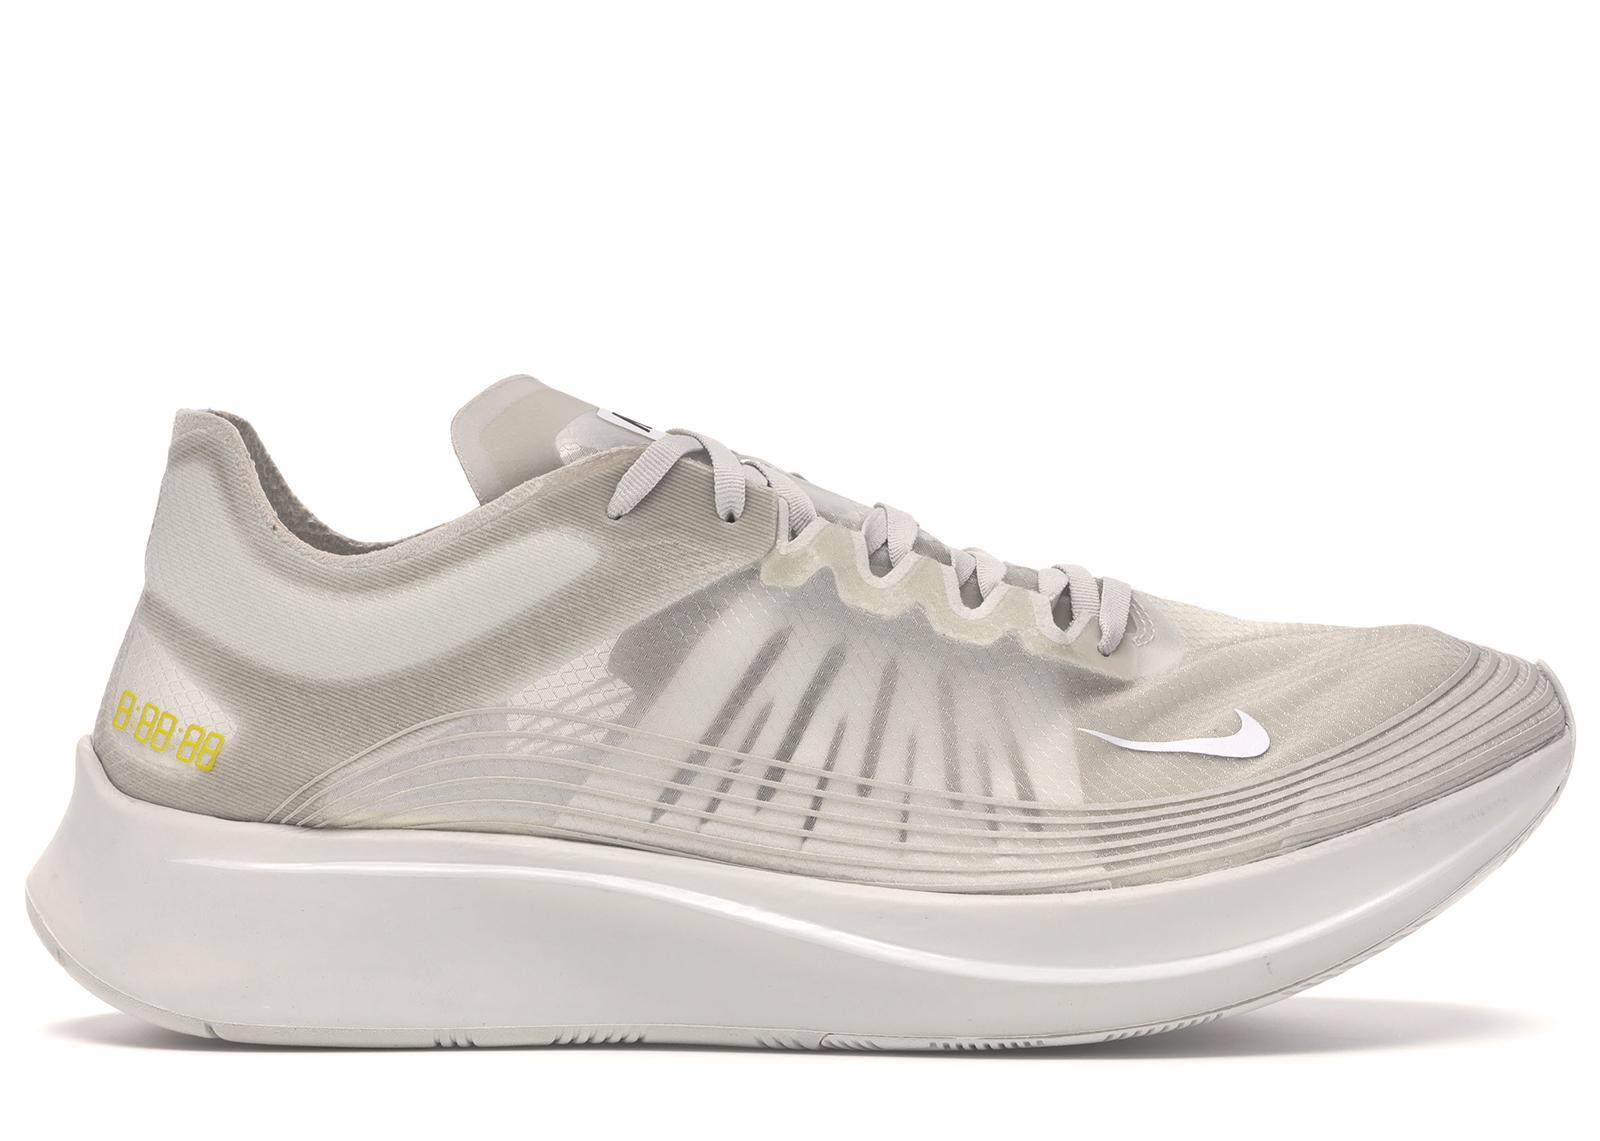 Nike Zoom Fly Light Bone - AJ9282-002